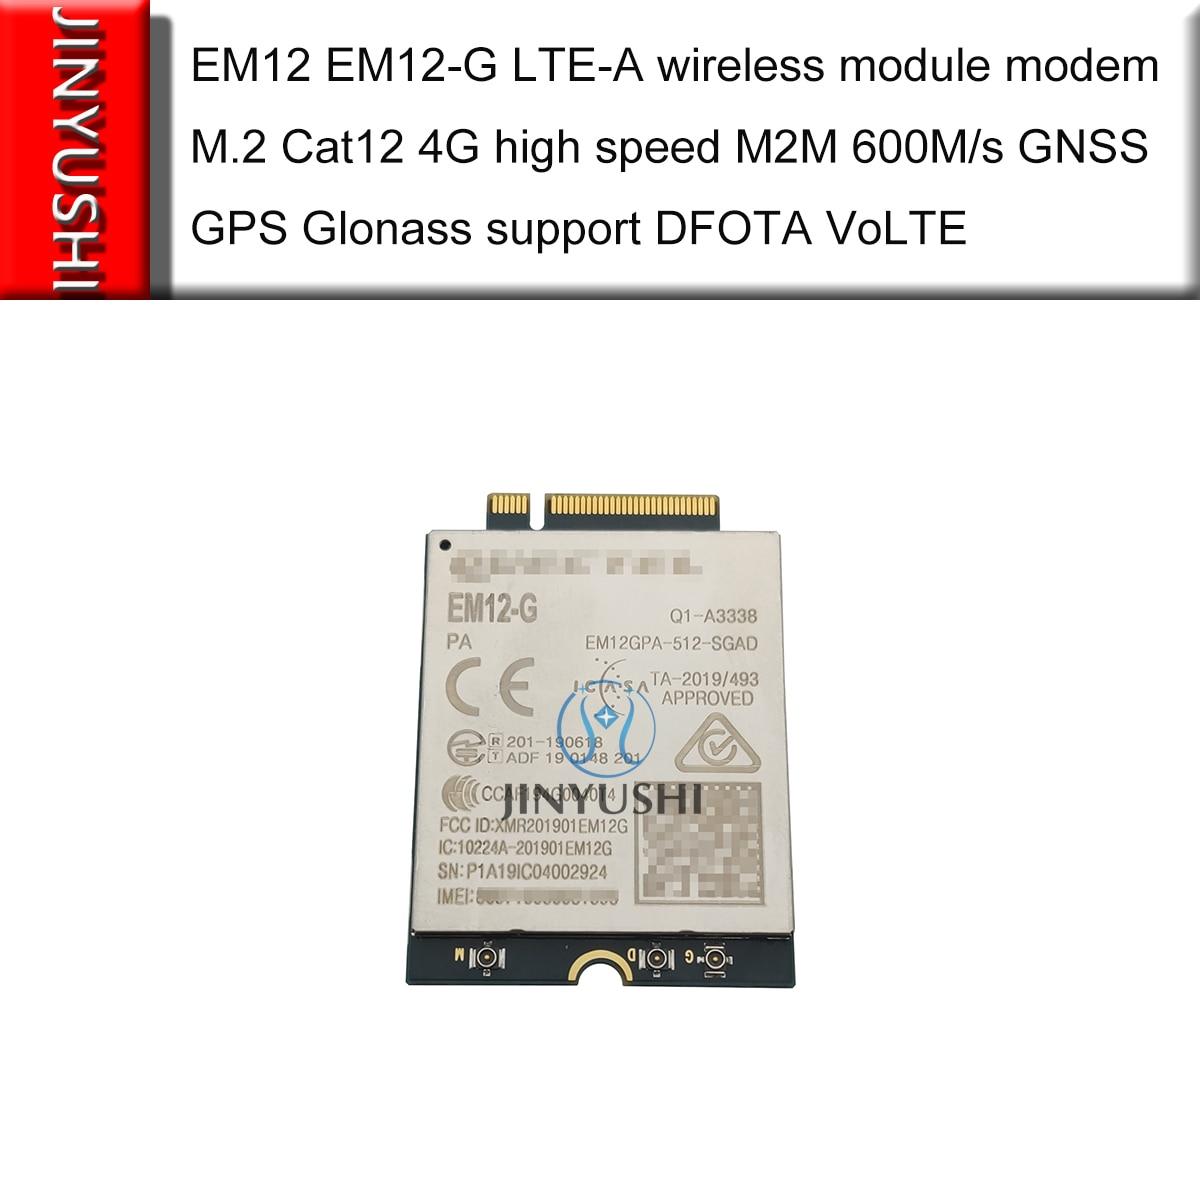 EM12-G New Original LTE-A Wireless Module Modem M.2 Cat12 EM12 4G High Speed M2M 600M/s +M.2 To USB Adapter+MHF4 To SMA Pigtail